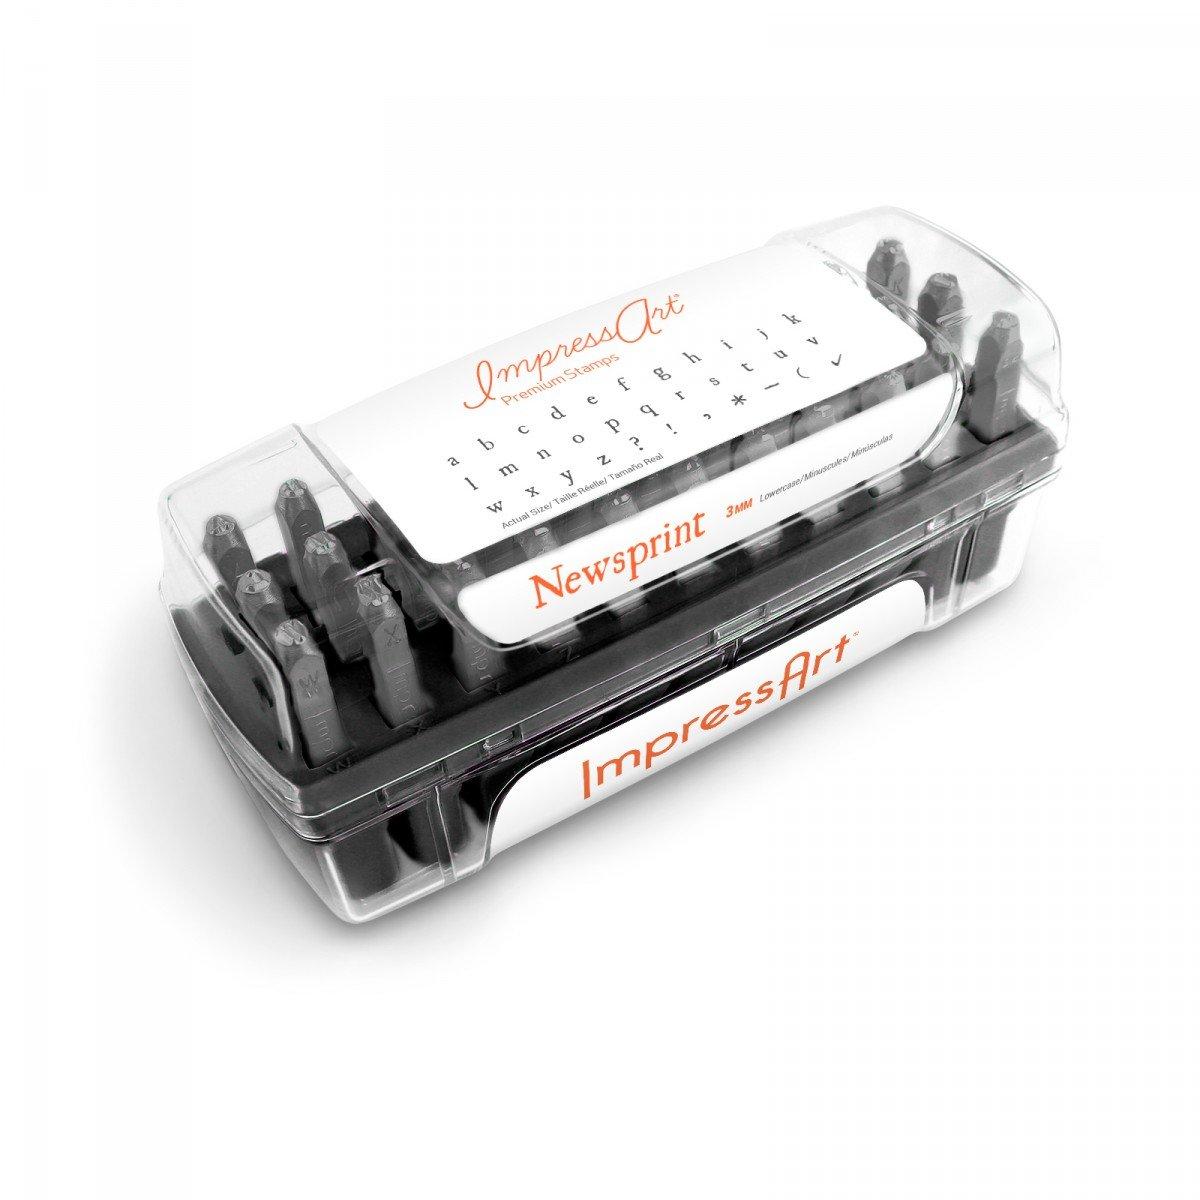 ImpressArt- Premium Newsprint Letter Stamps, Lowercase 4336839362